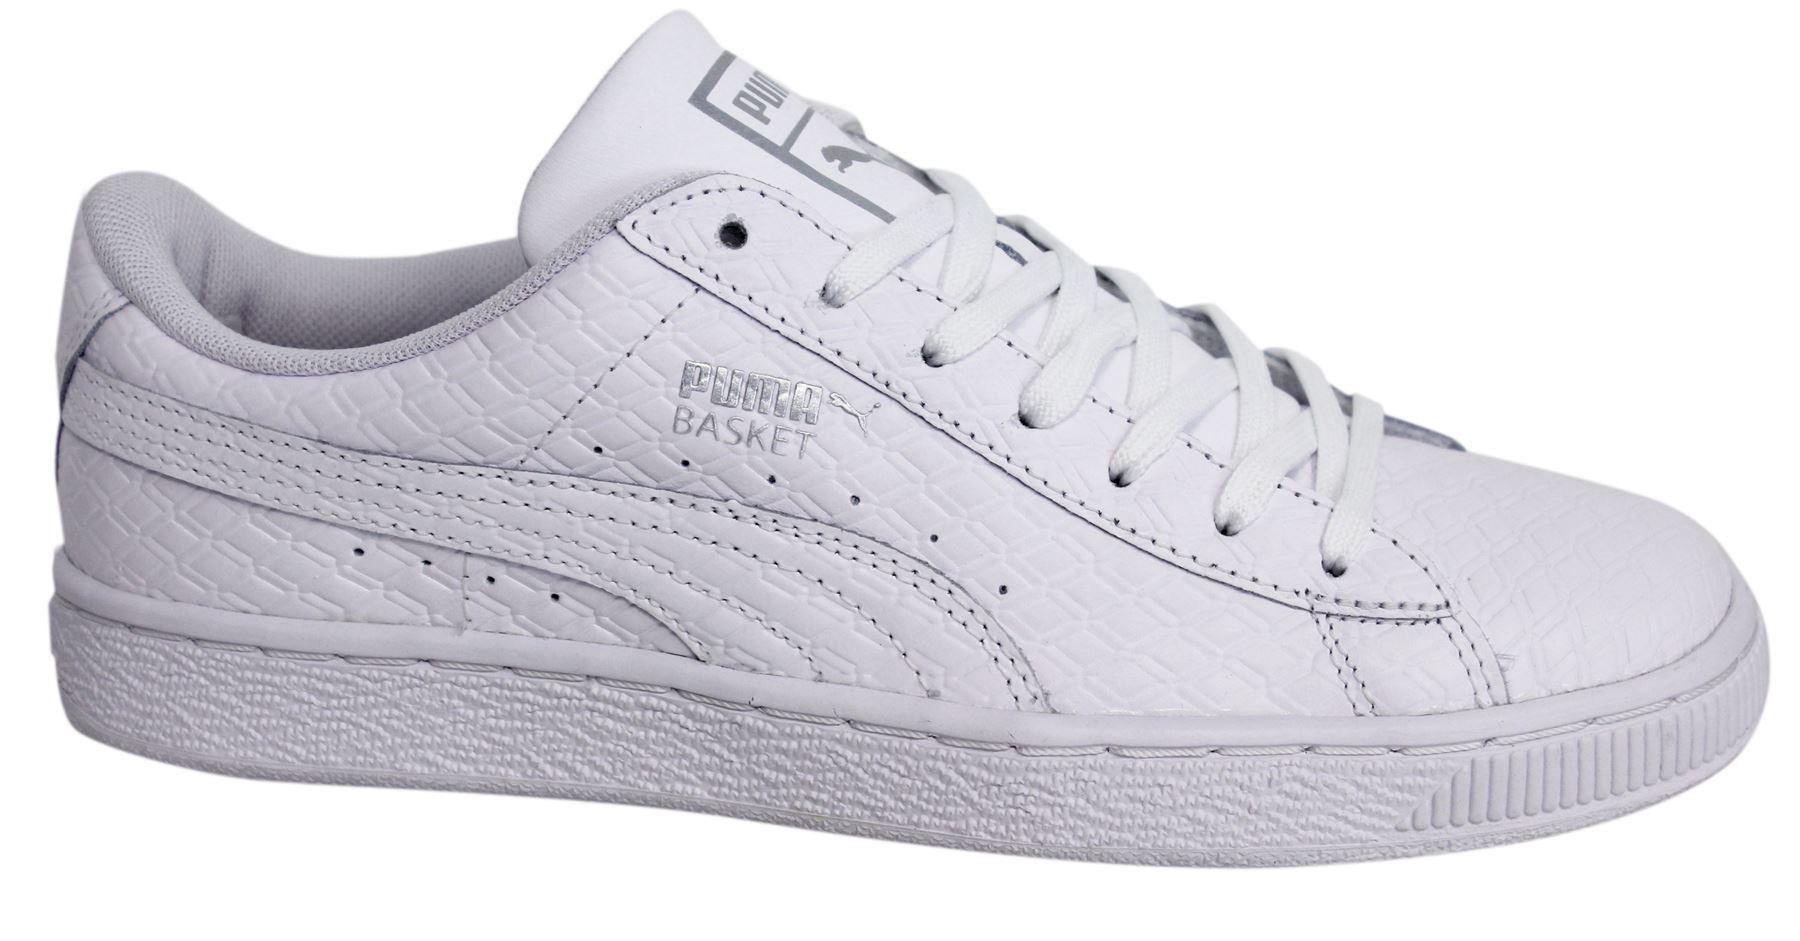 Puma Basket Classic B W Lace Up White Leather Mens Trainers 363075 01 D19 d0c5ef3f0